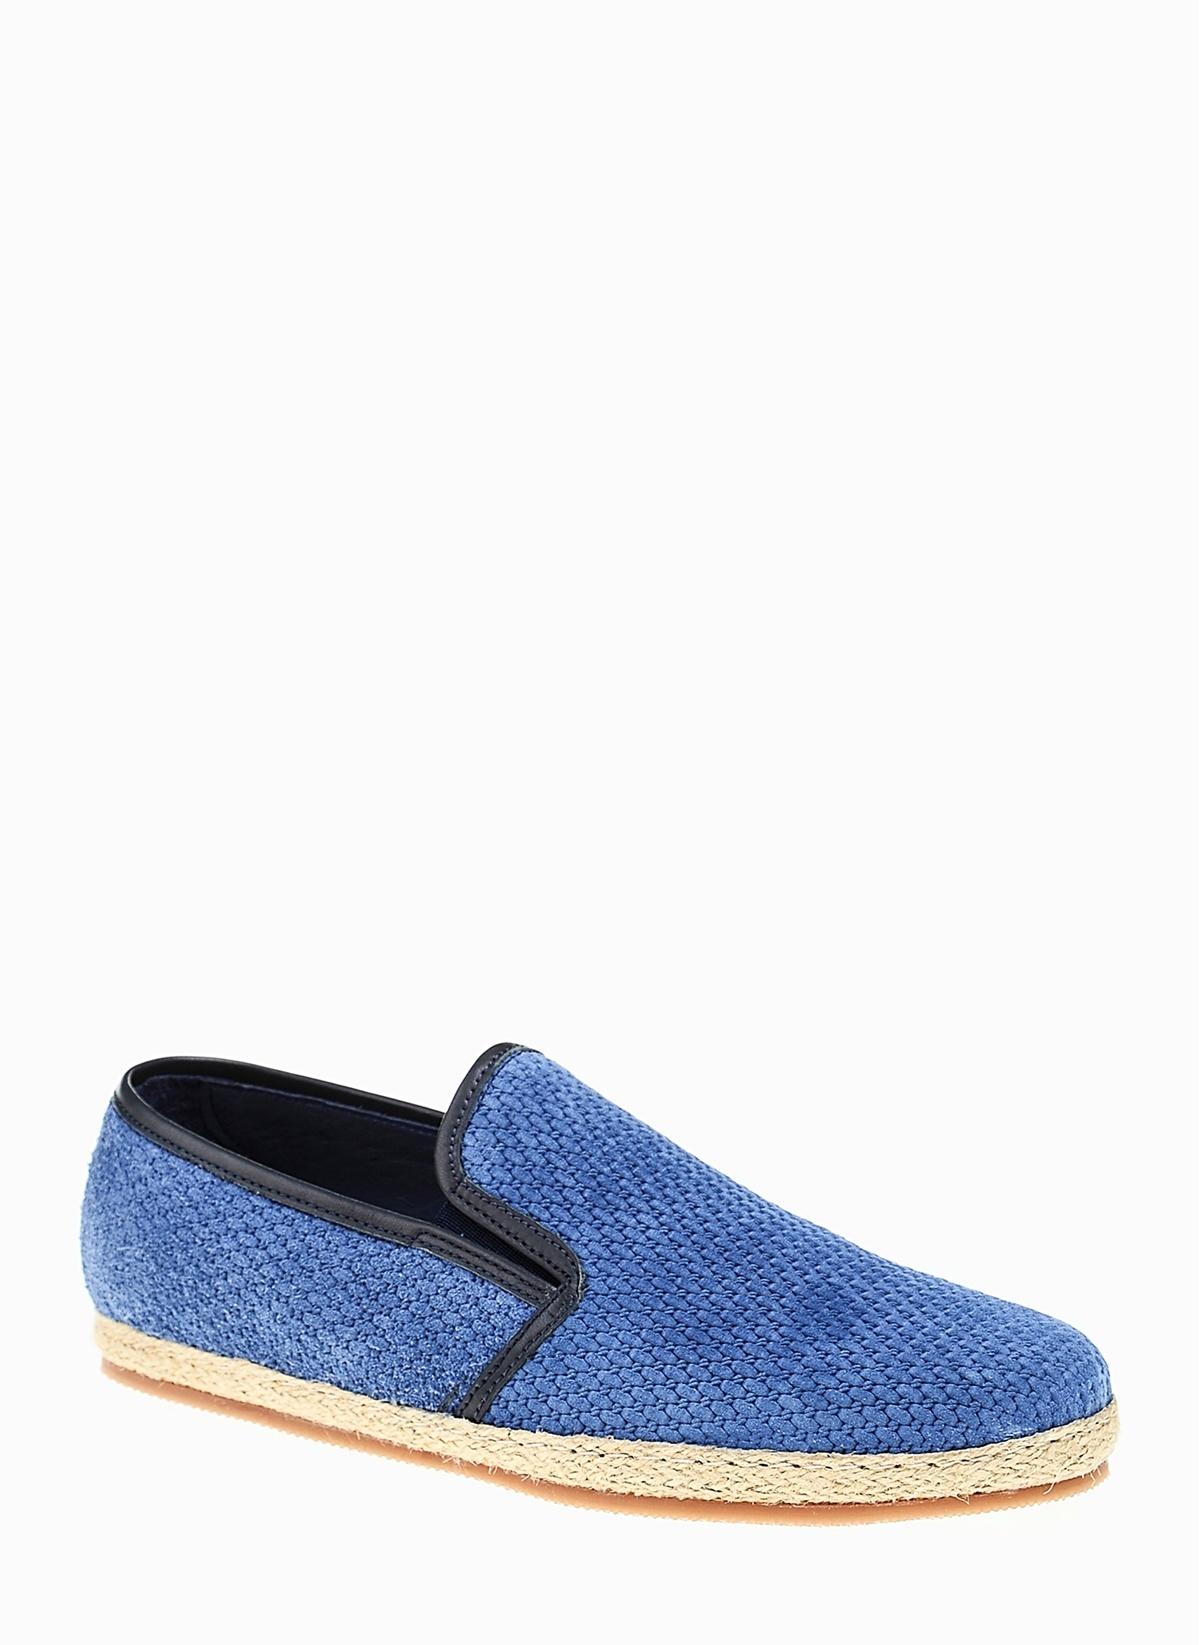 Divarese %100 Deri Sneaker Ayakkabı 5021150 E Loafer – 239.0 TL